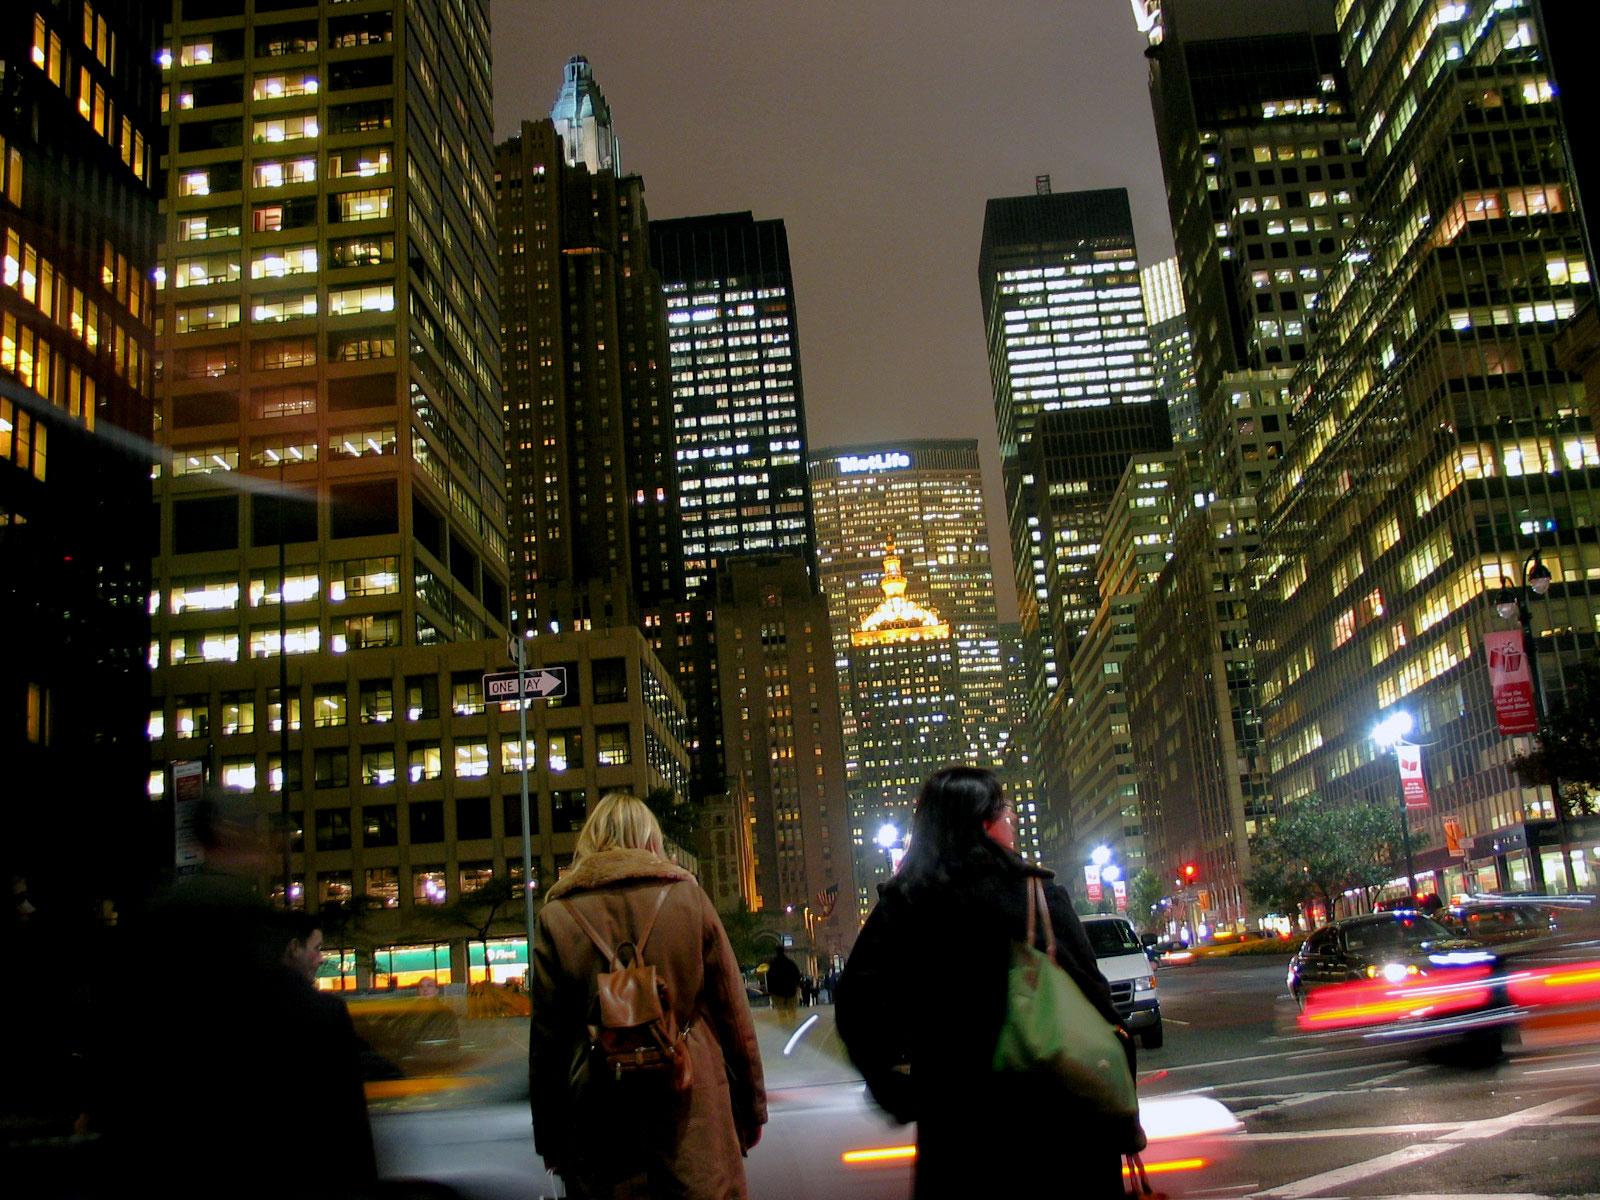 Manhattan by night. Kuva: Miika Mattila